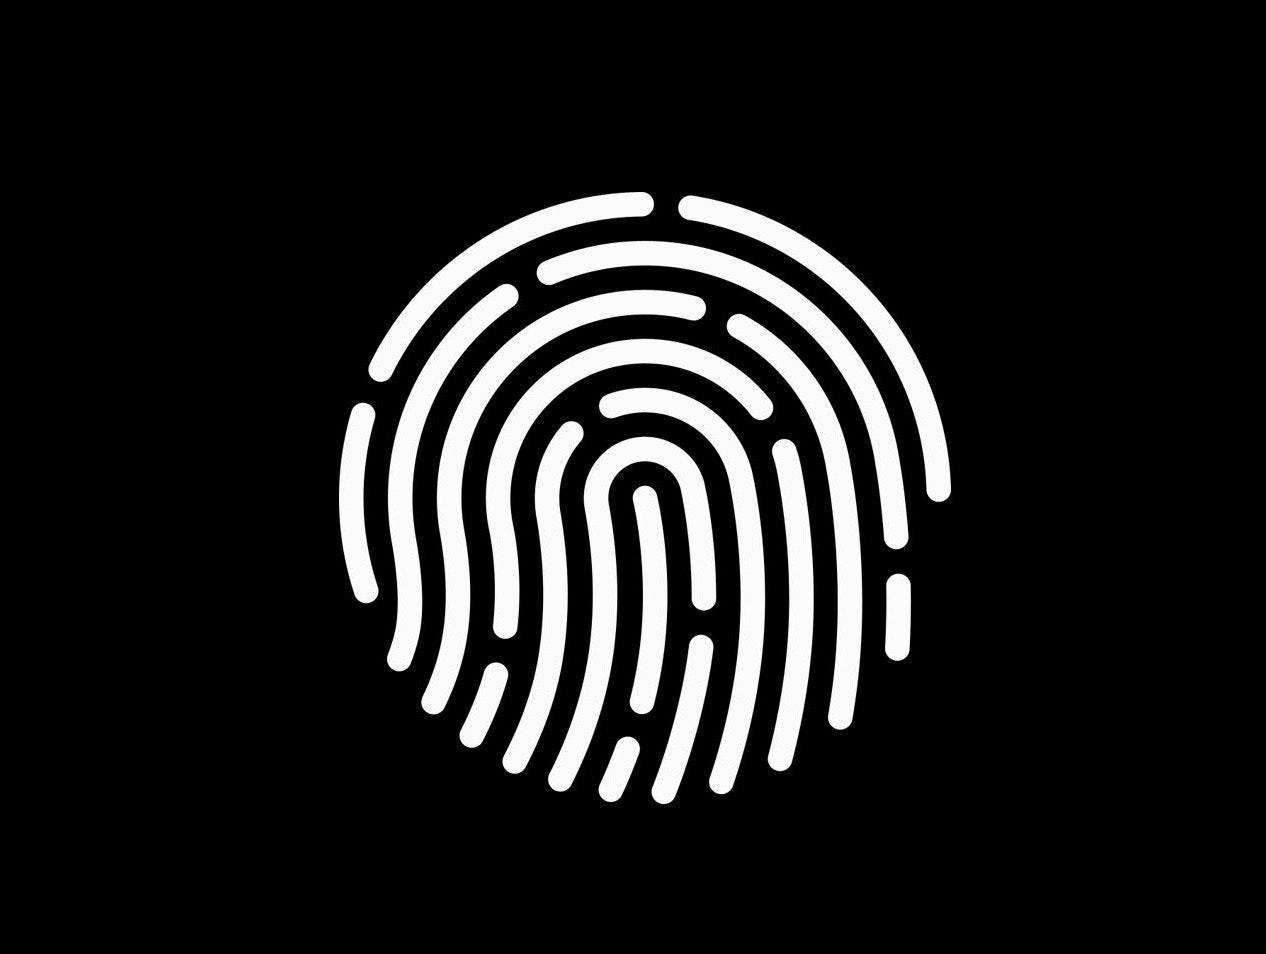 Instamotor's Fraud & Safety Team